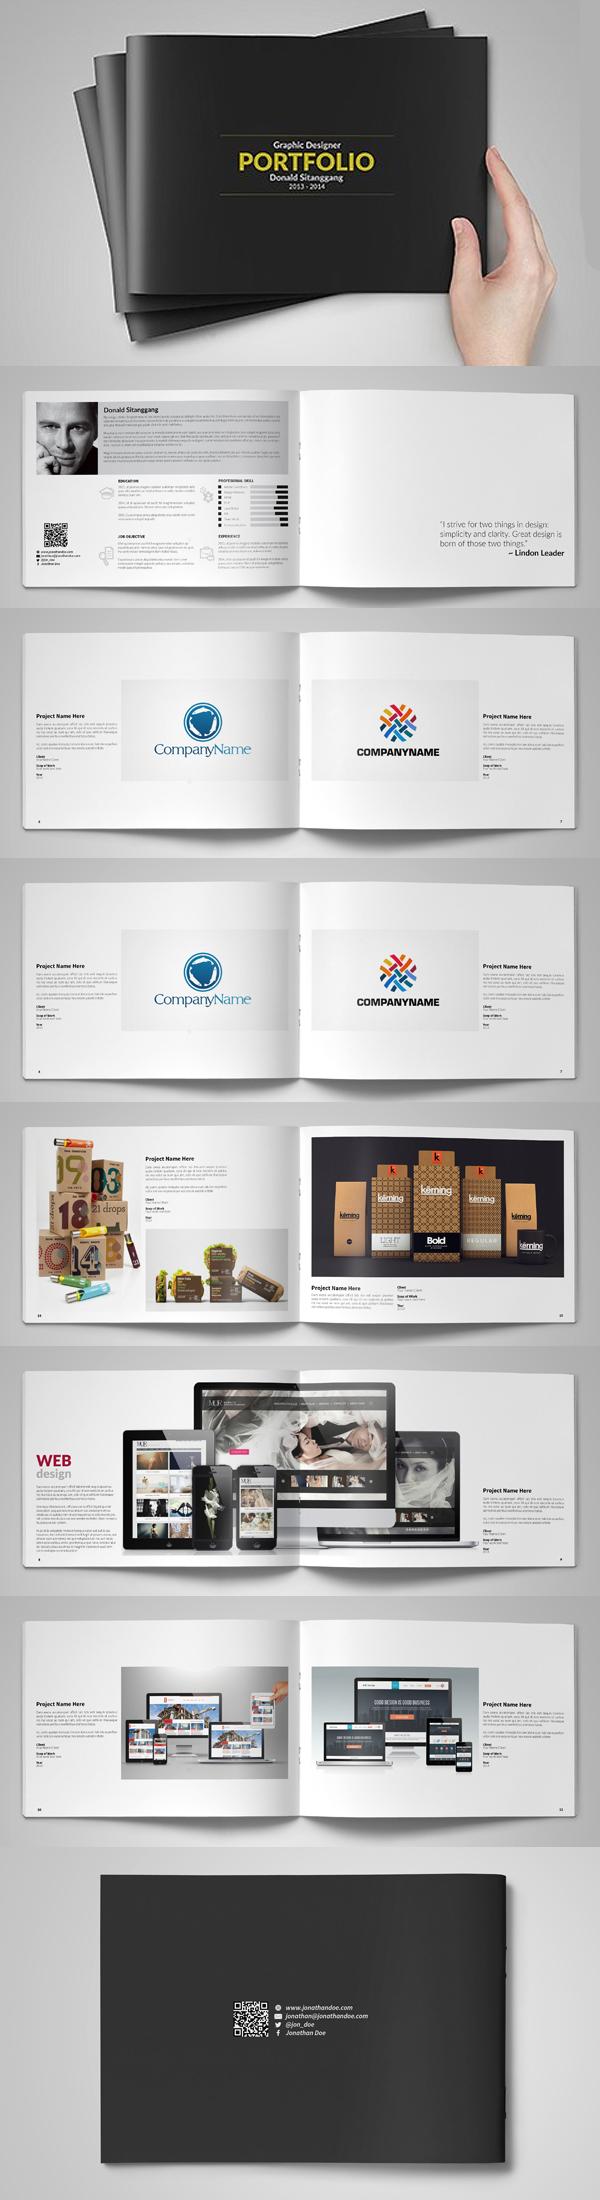 100 Professional Corporate Brochure Templates - 23